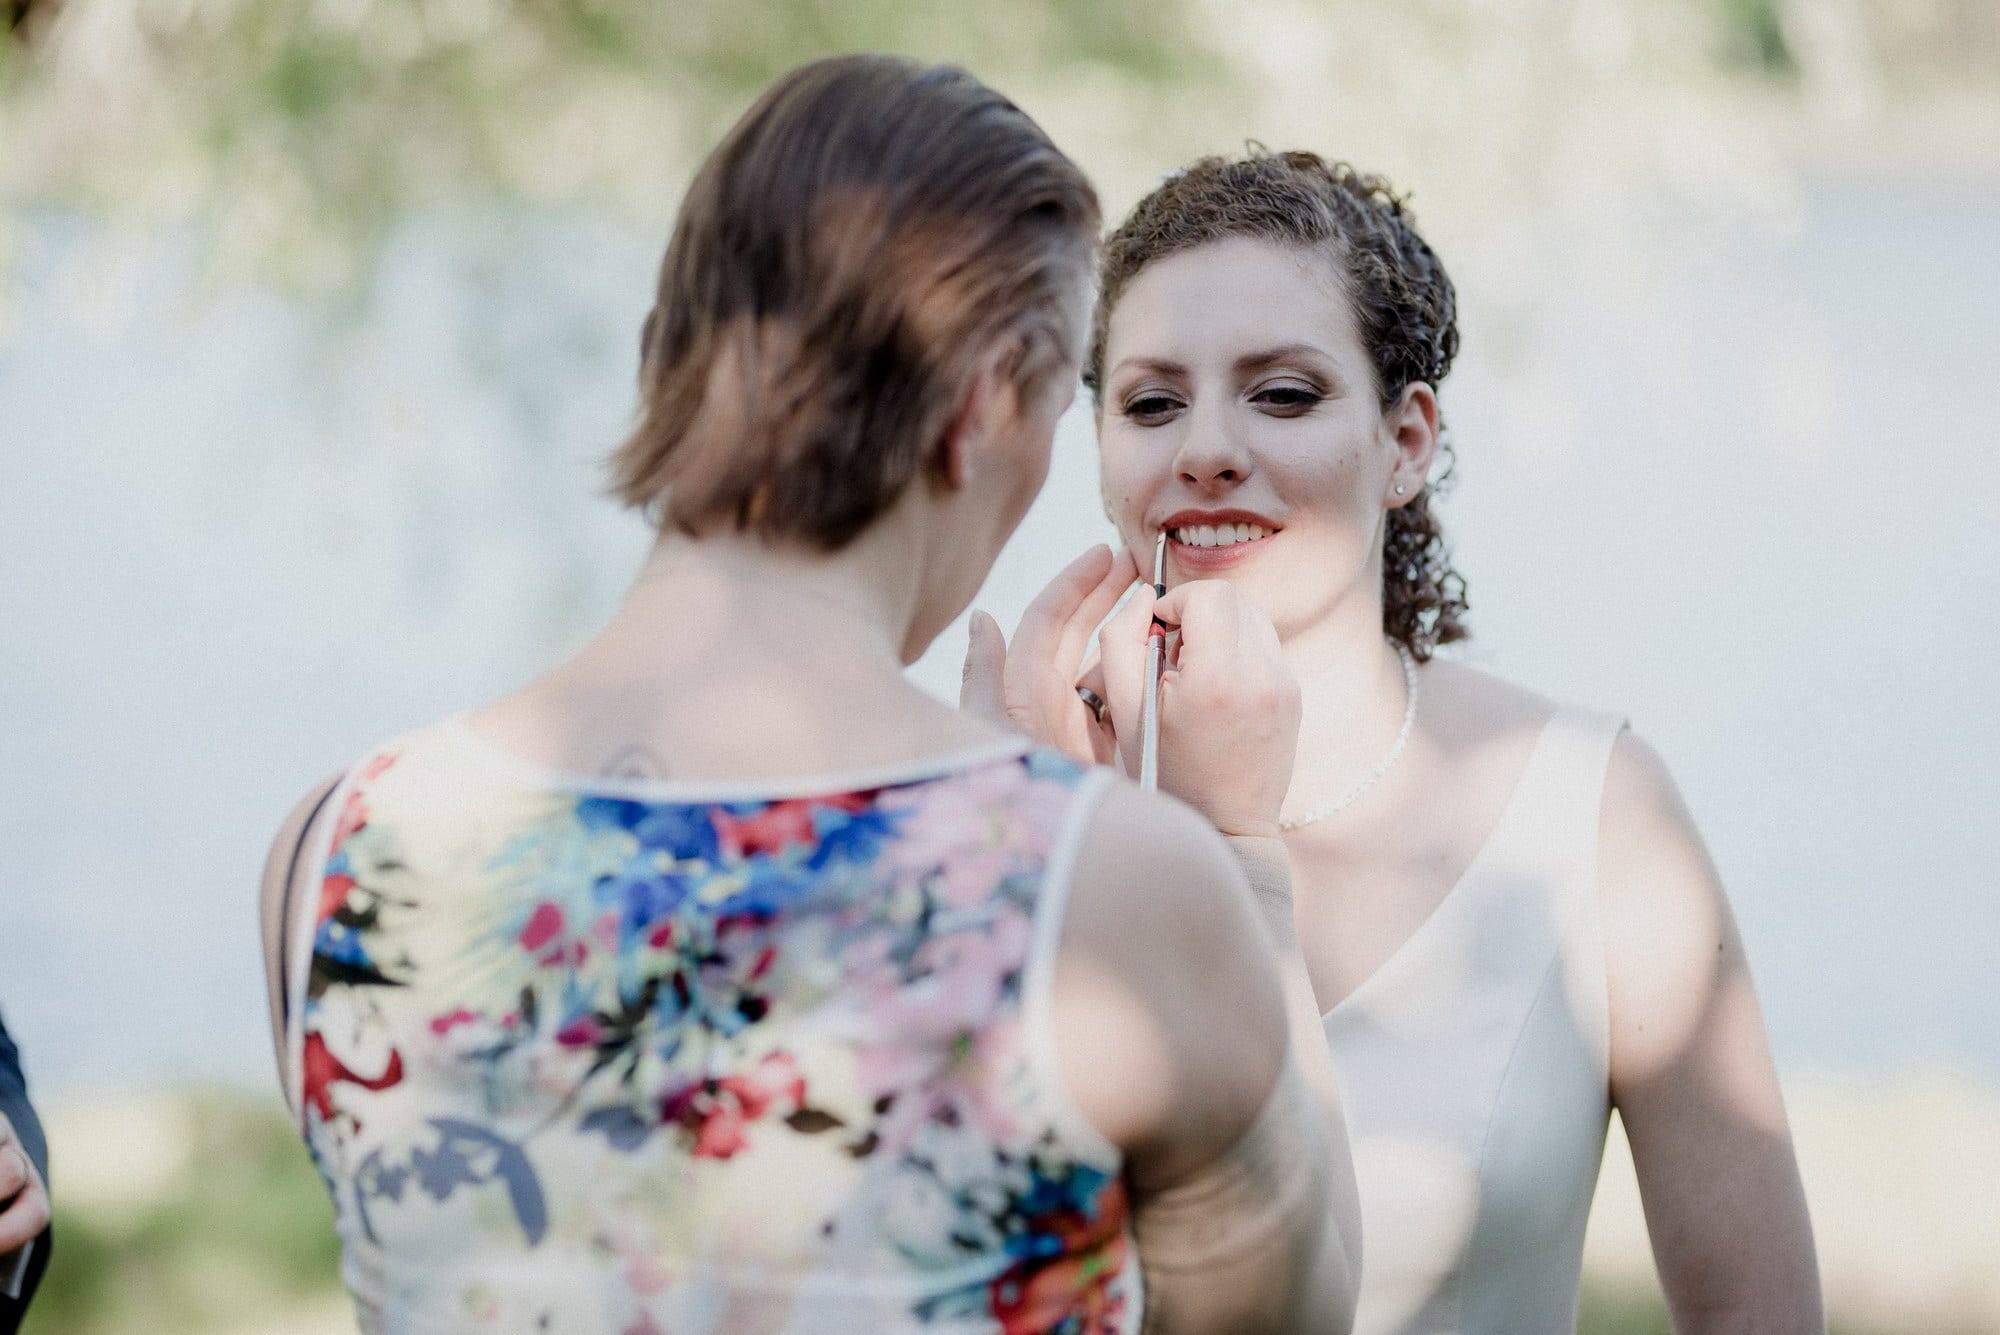 Christine Raab Brautstyling Lippen schminken Braut